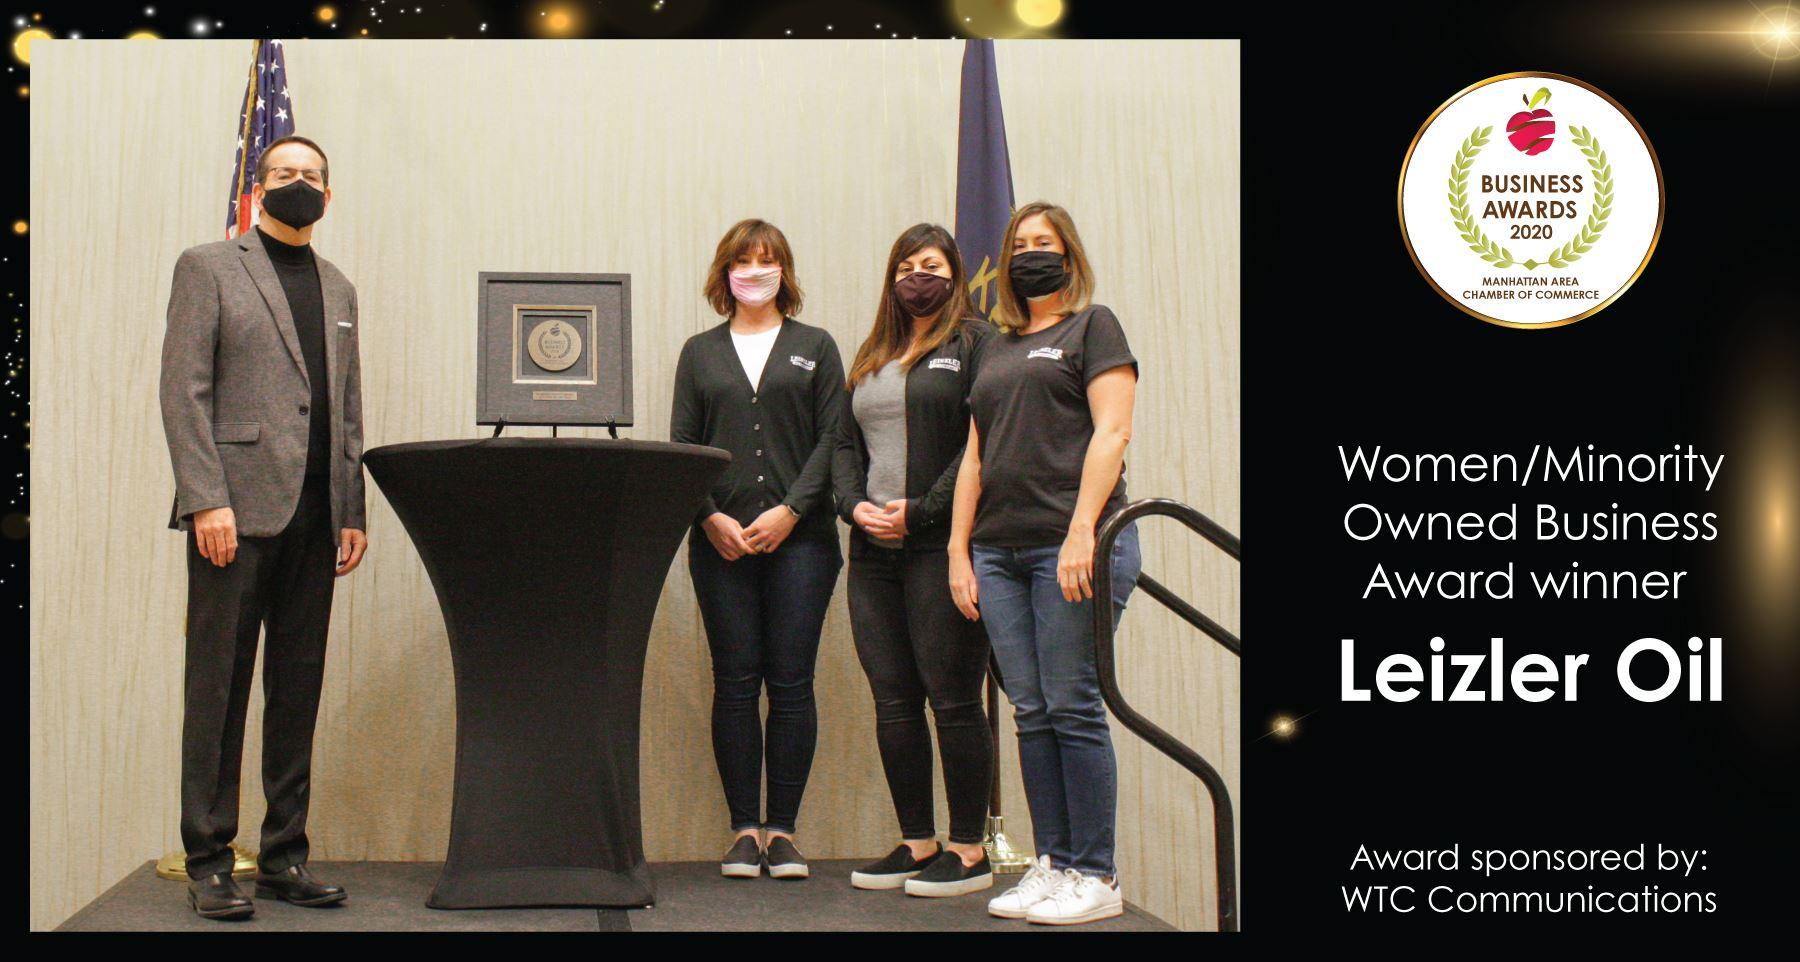 Leizler Oil Receives the Women/Minority Owned Business Award